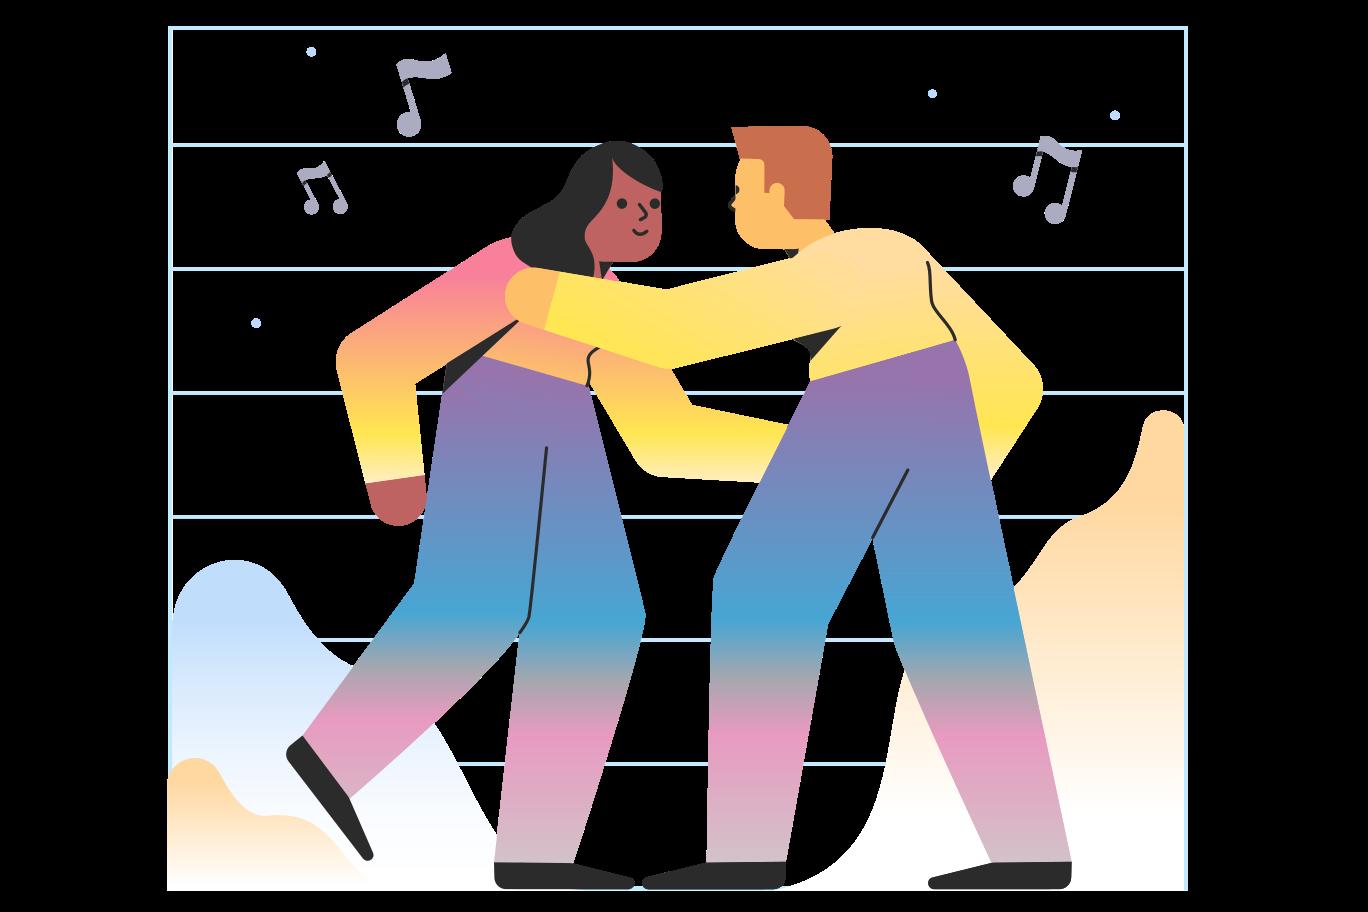 Dancing Clipart illustration in PNG, SVG